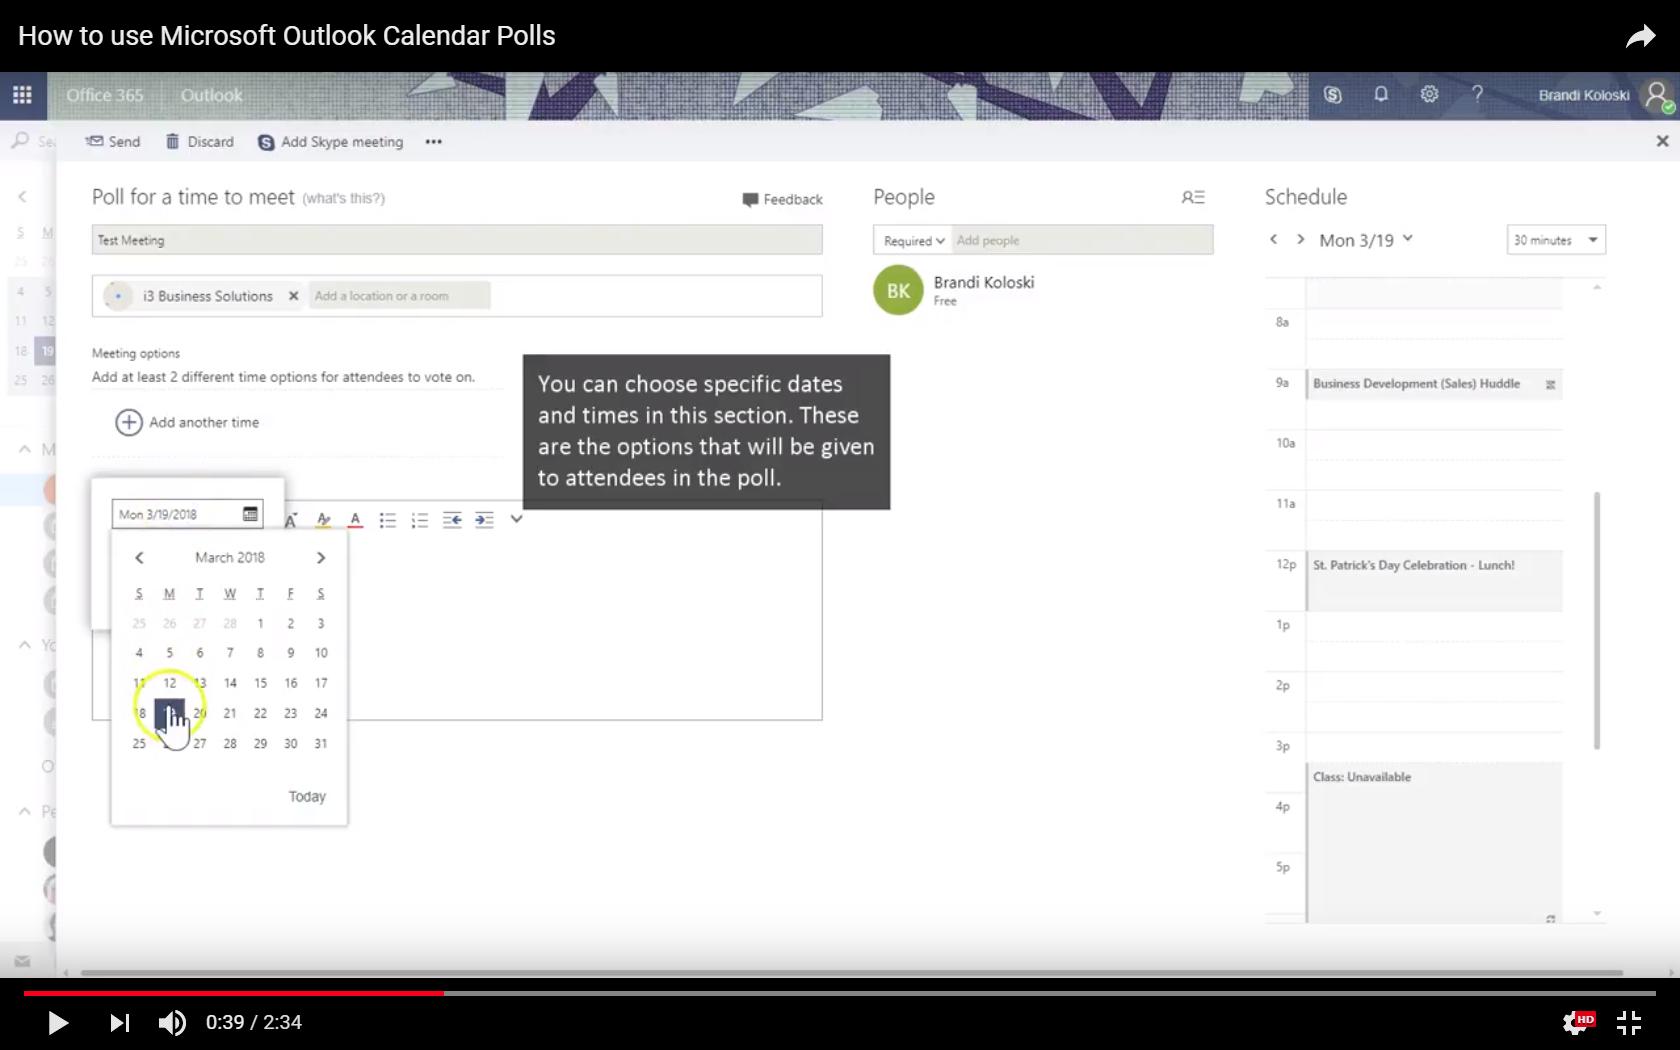 Microsoft Office 356: Outlook Calendar Polling